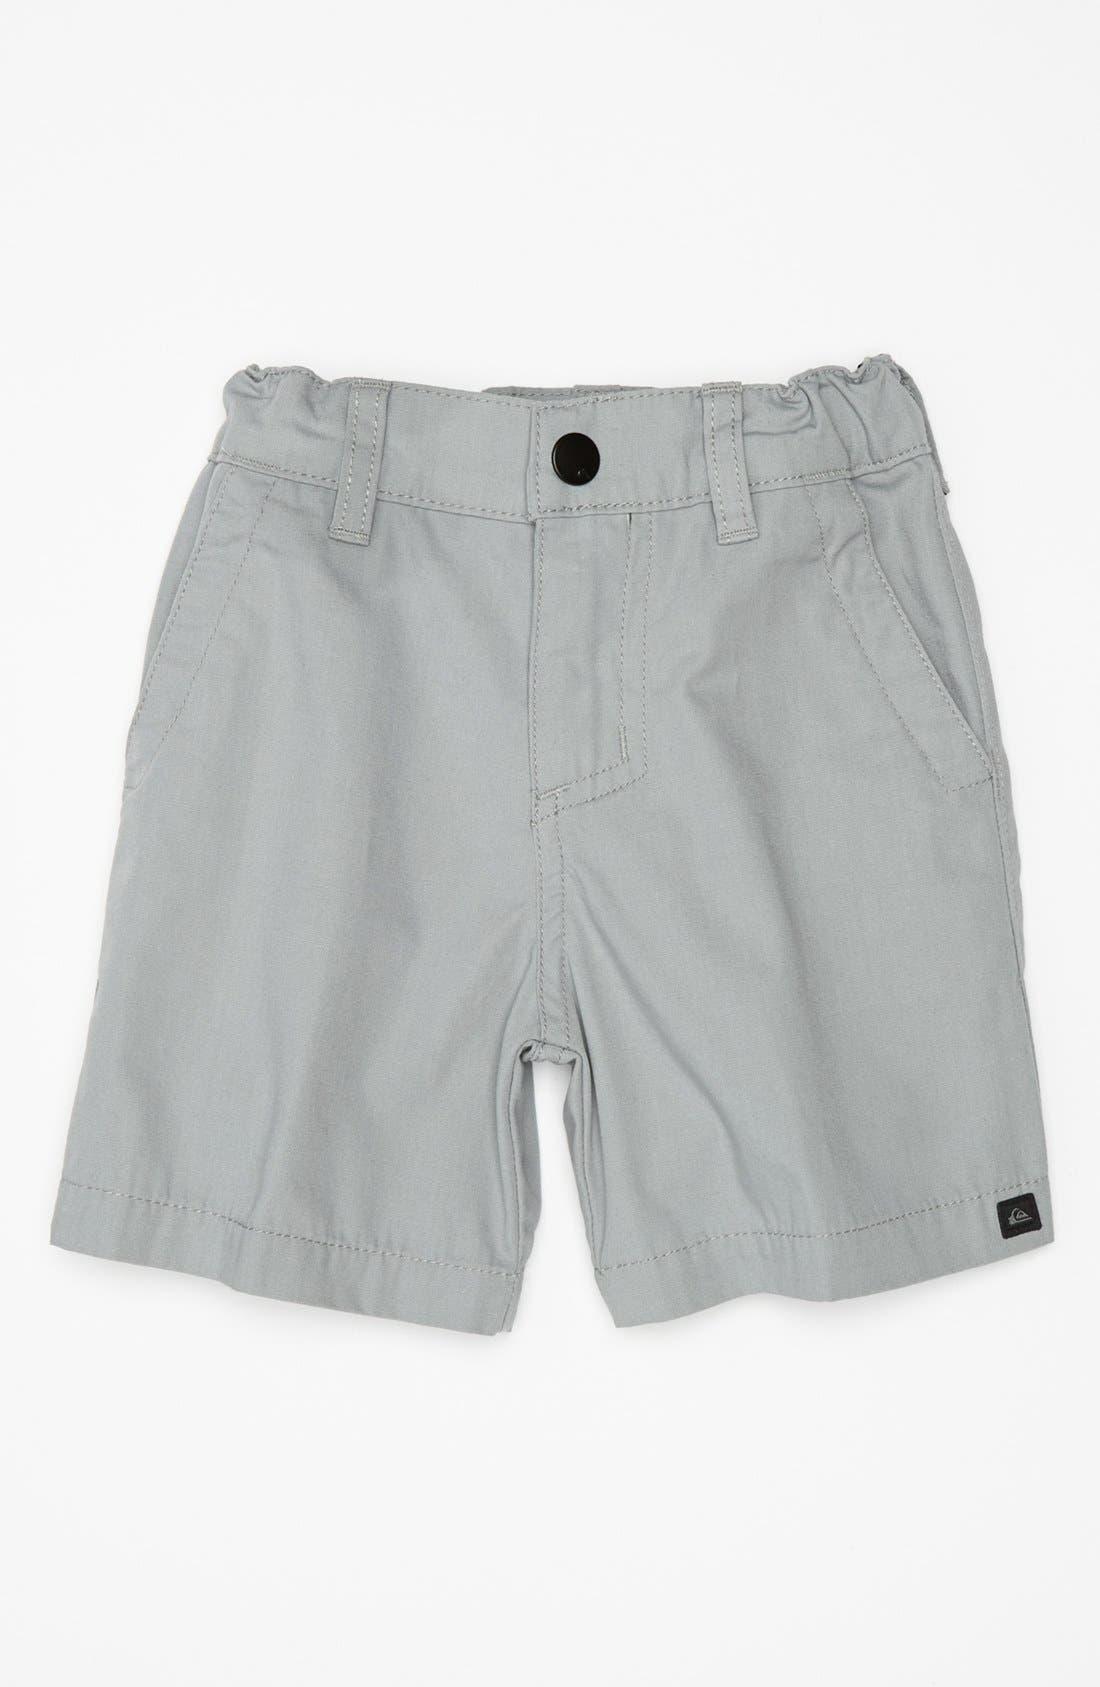 Alternate Image 1 Selected - Quiksilver 'Rockefeller' Shorts (Baby Boys)